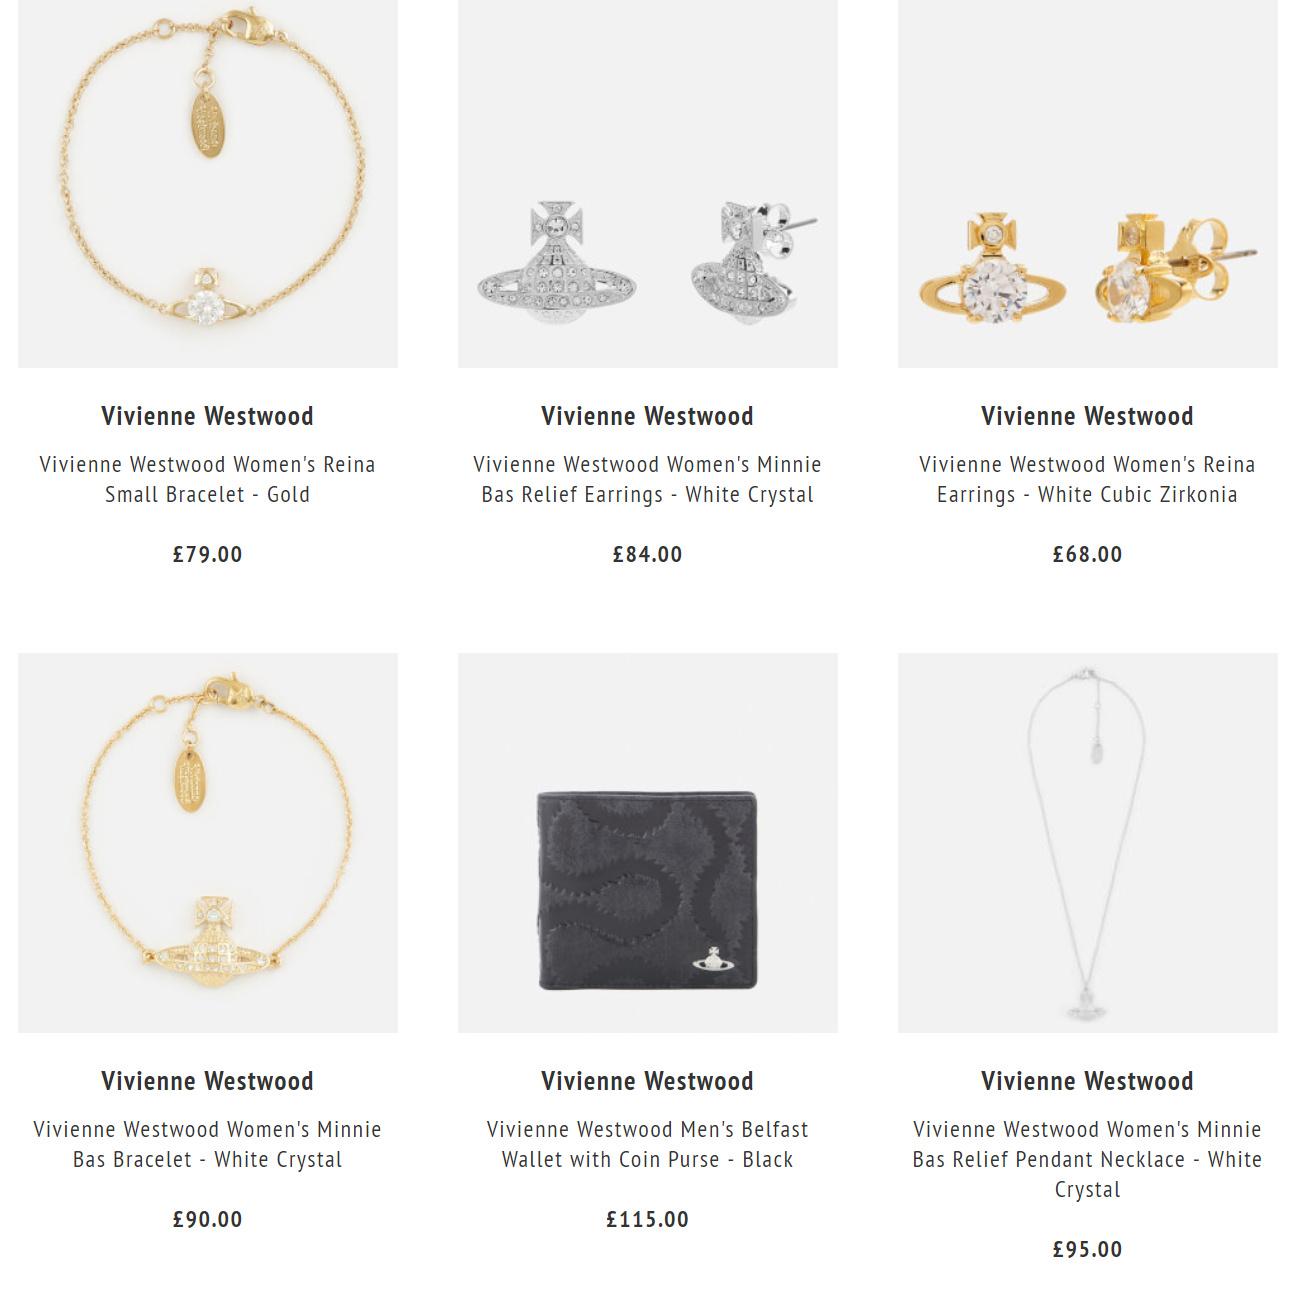 Vivienne Westwood75折咯,含王俊凯同款土星项链